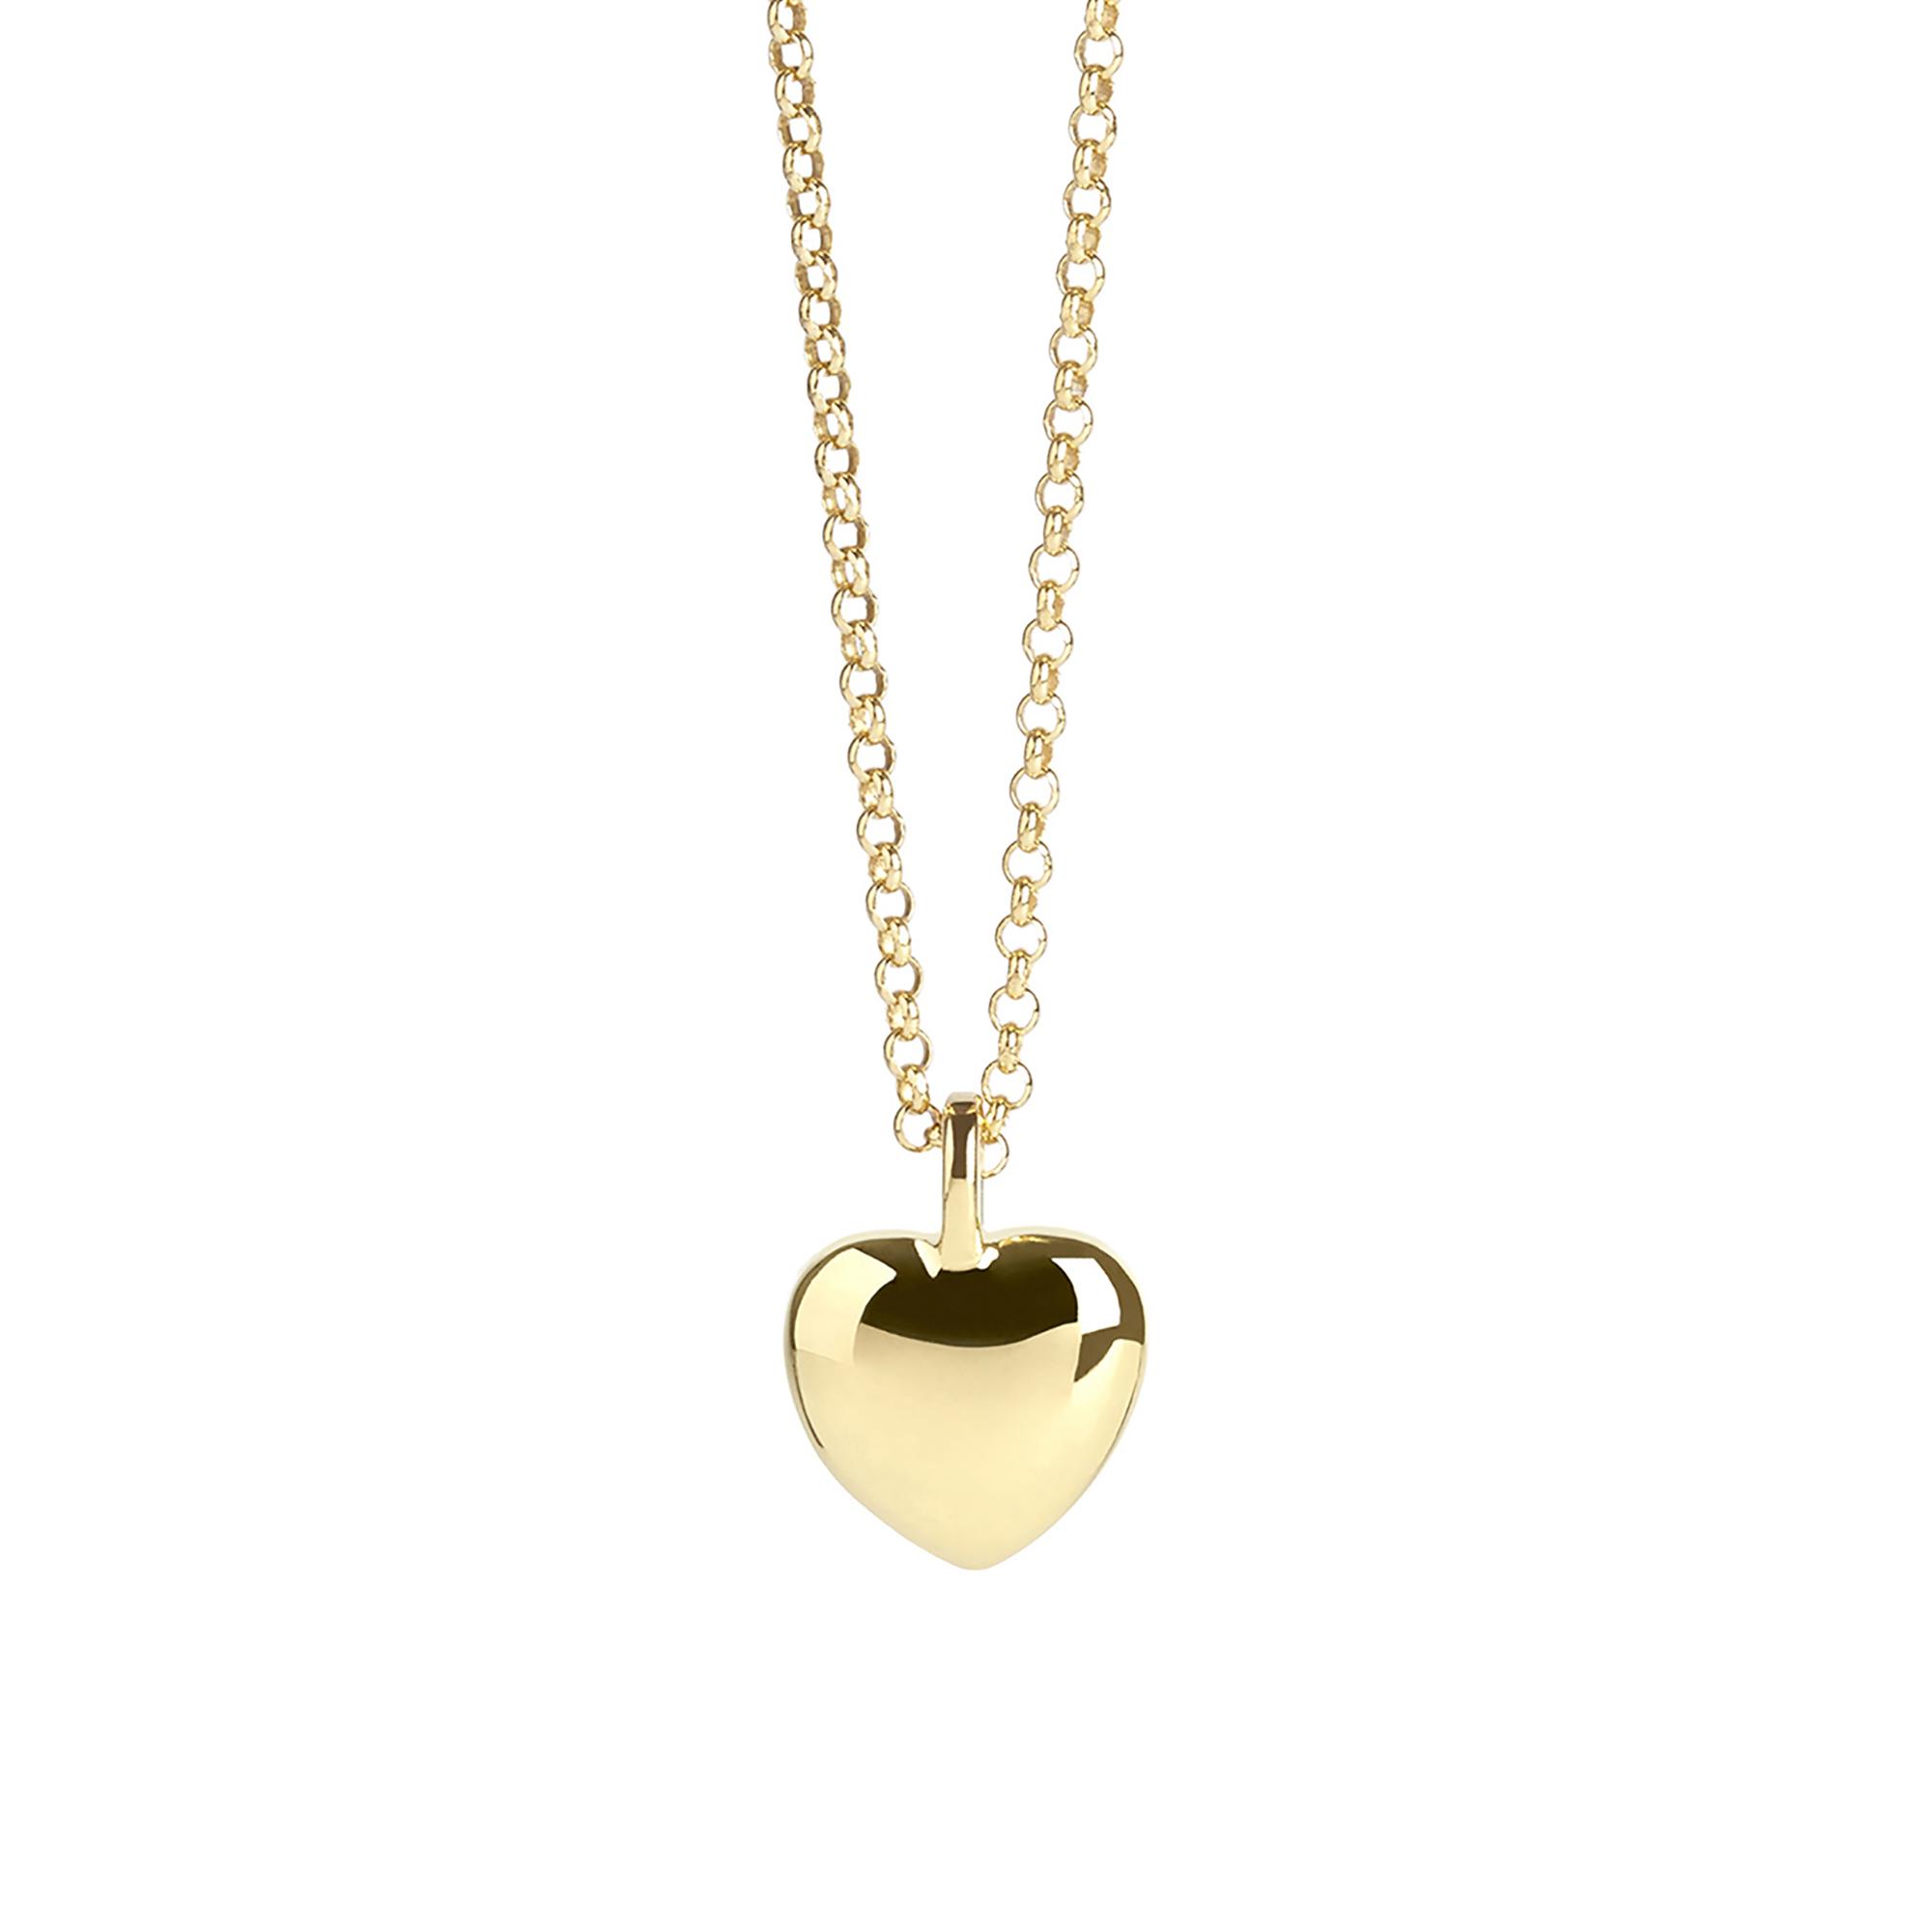 Muru Heart Pebble Necklace Gold Plated Vermeil